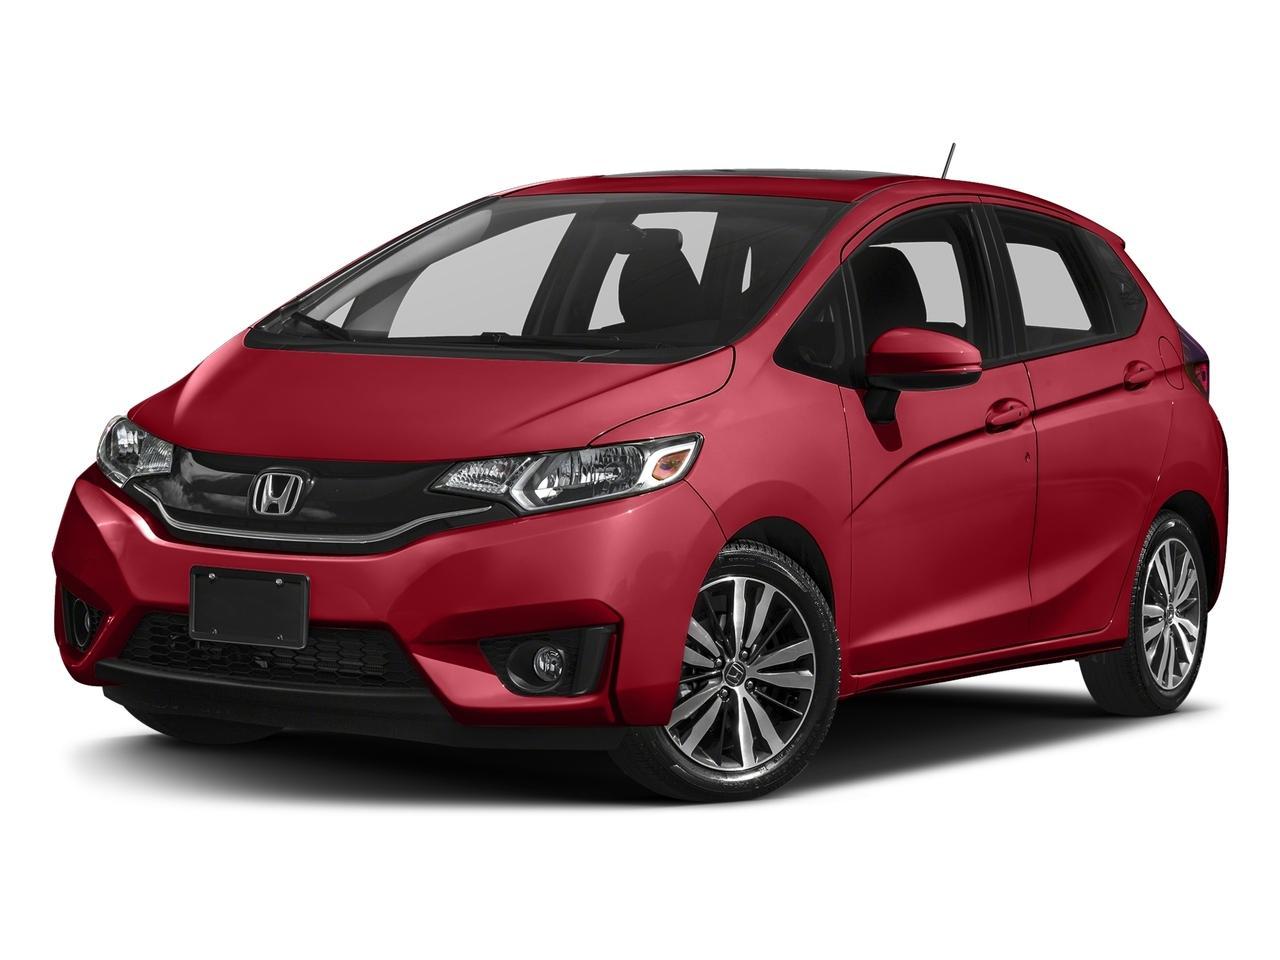 2017 Honda Fit Vehicle Photo in San Antonio, TX 78238